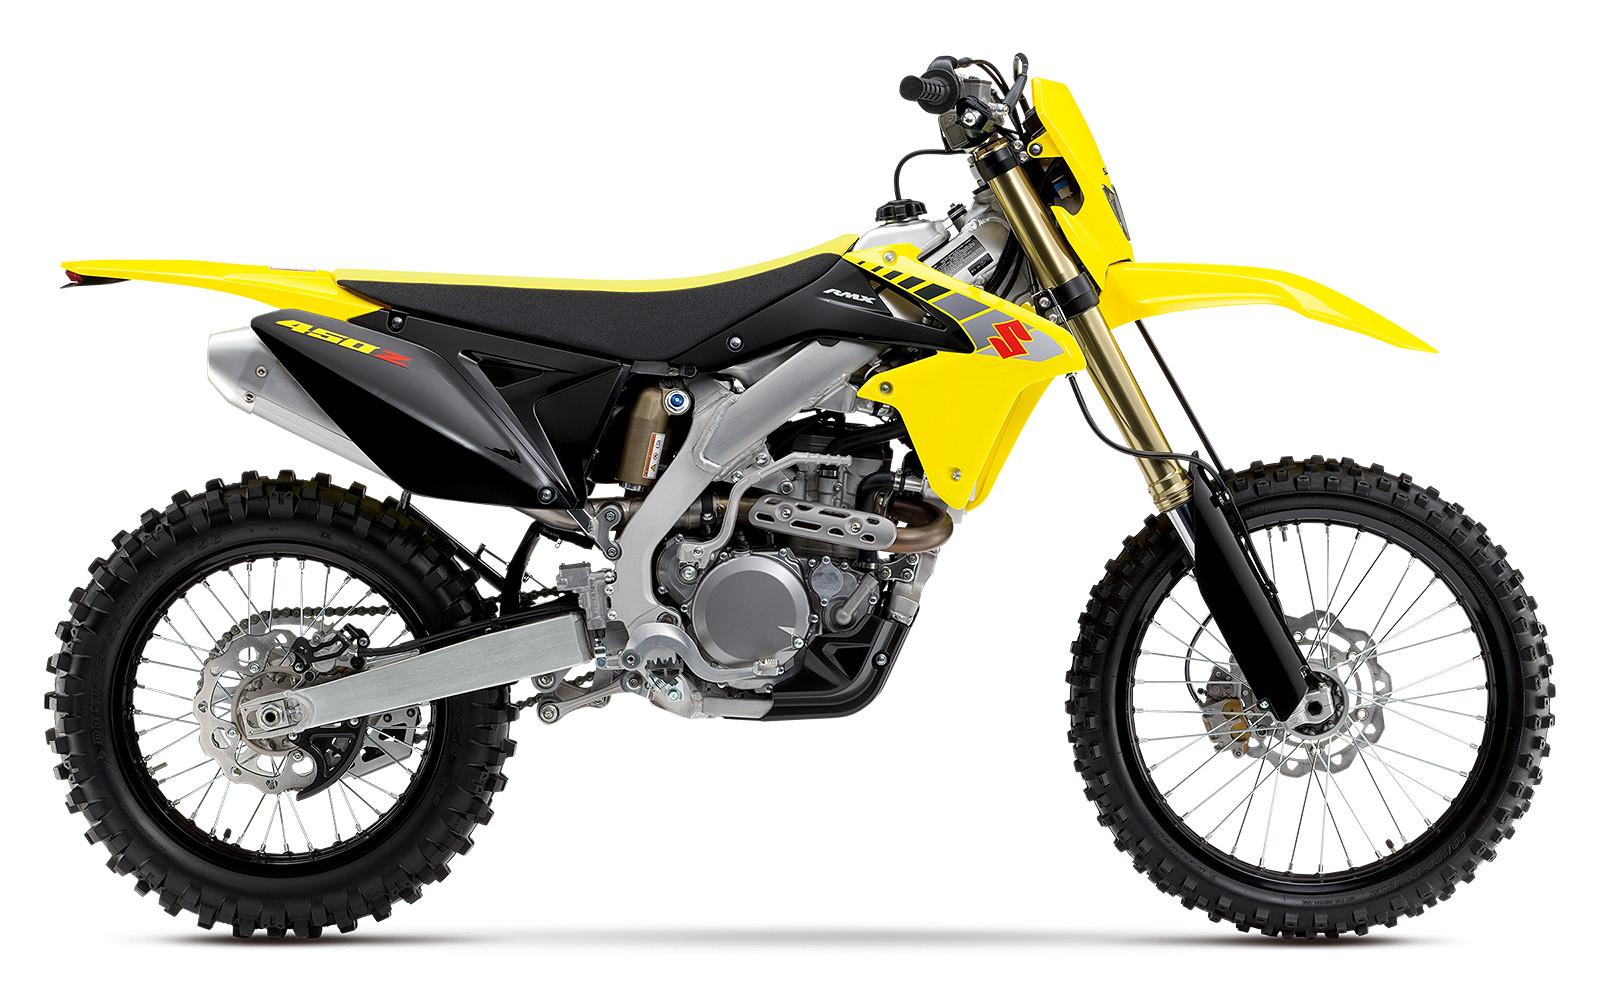 2017 Suzuki RMX450Z - First Look: 2017 Suzuki RM, RM-Z, and RMX Models - Motocross Pictures - Vital MX